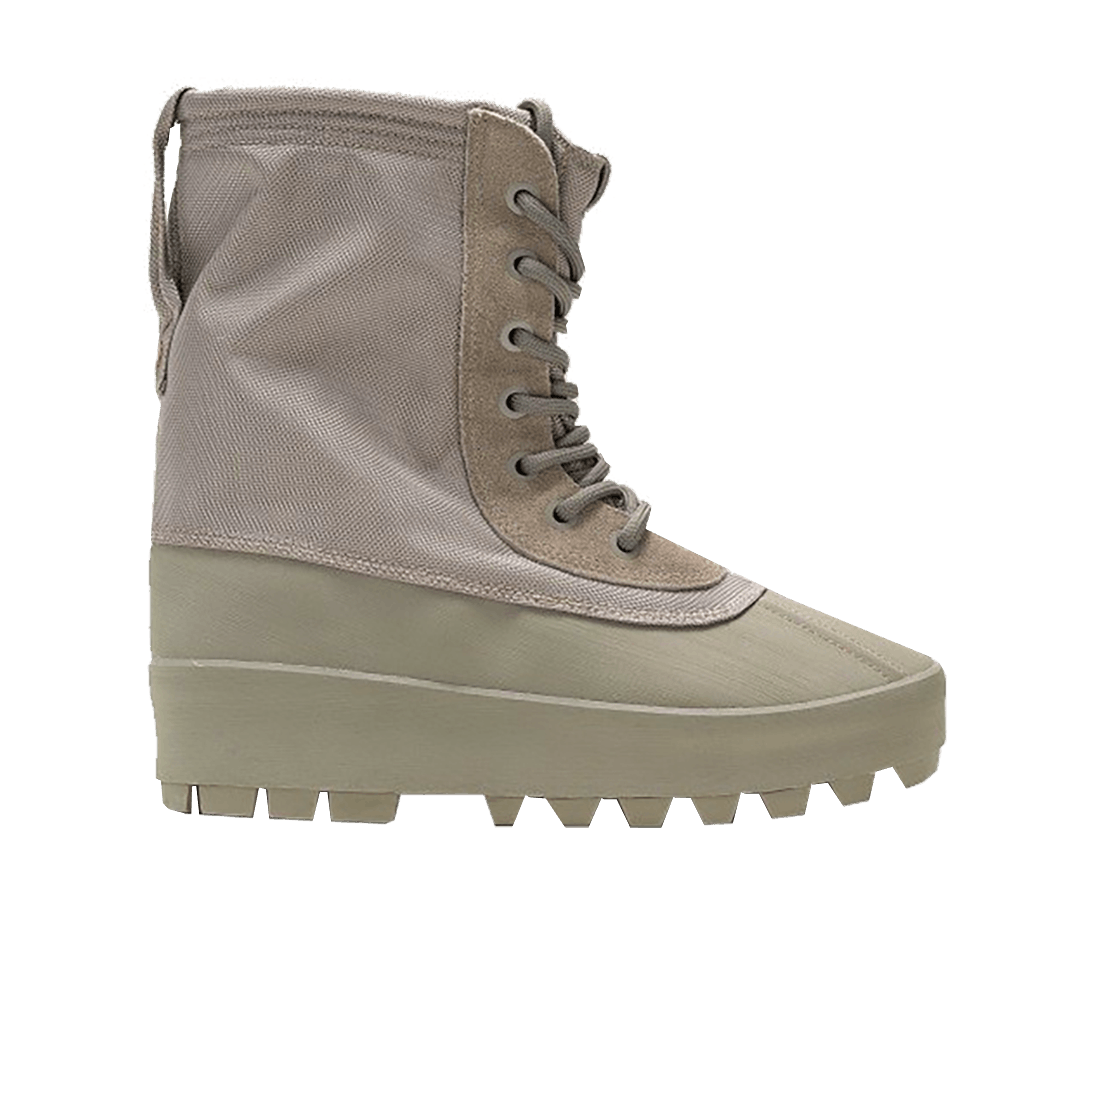 wholesale dealer c805f 8b30e Yeezy 950 Boot  Moonrock  - adidas - AQ4829   GOAT